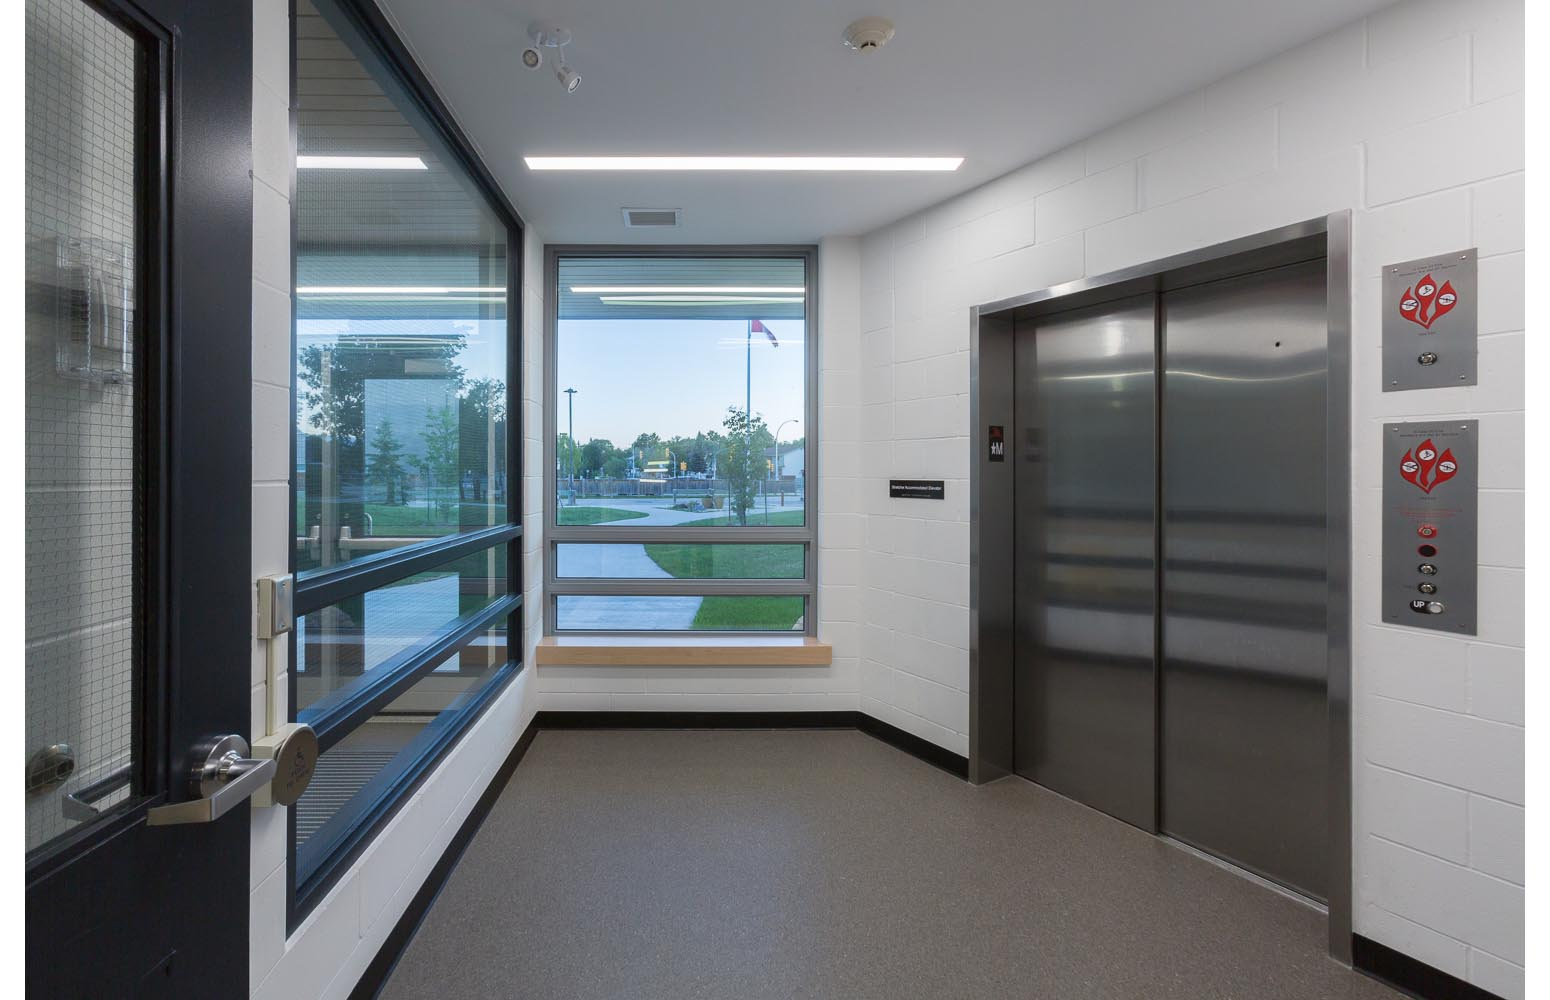 Dalhousie School Elevator Addition, interior of elevator entrance / Photo:  Lindsay Reid